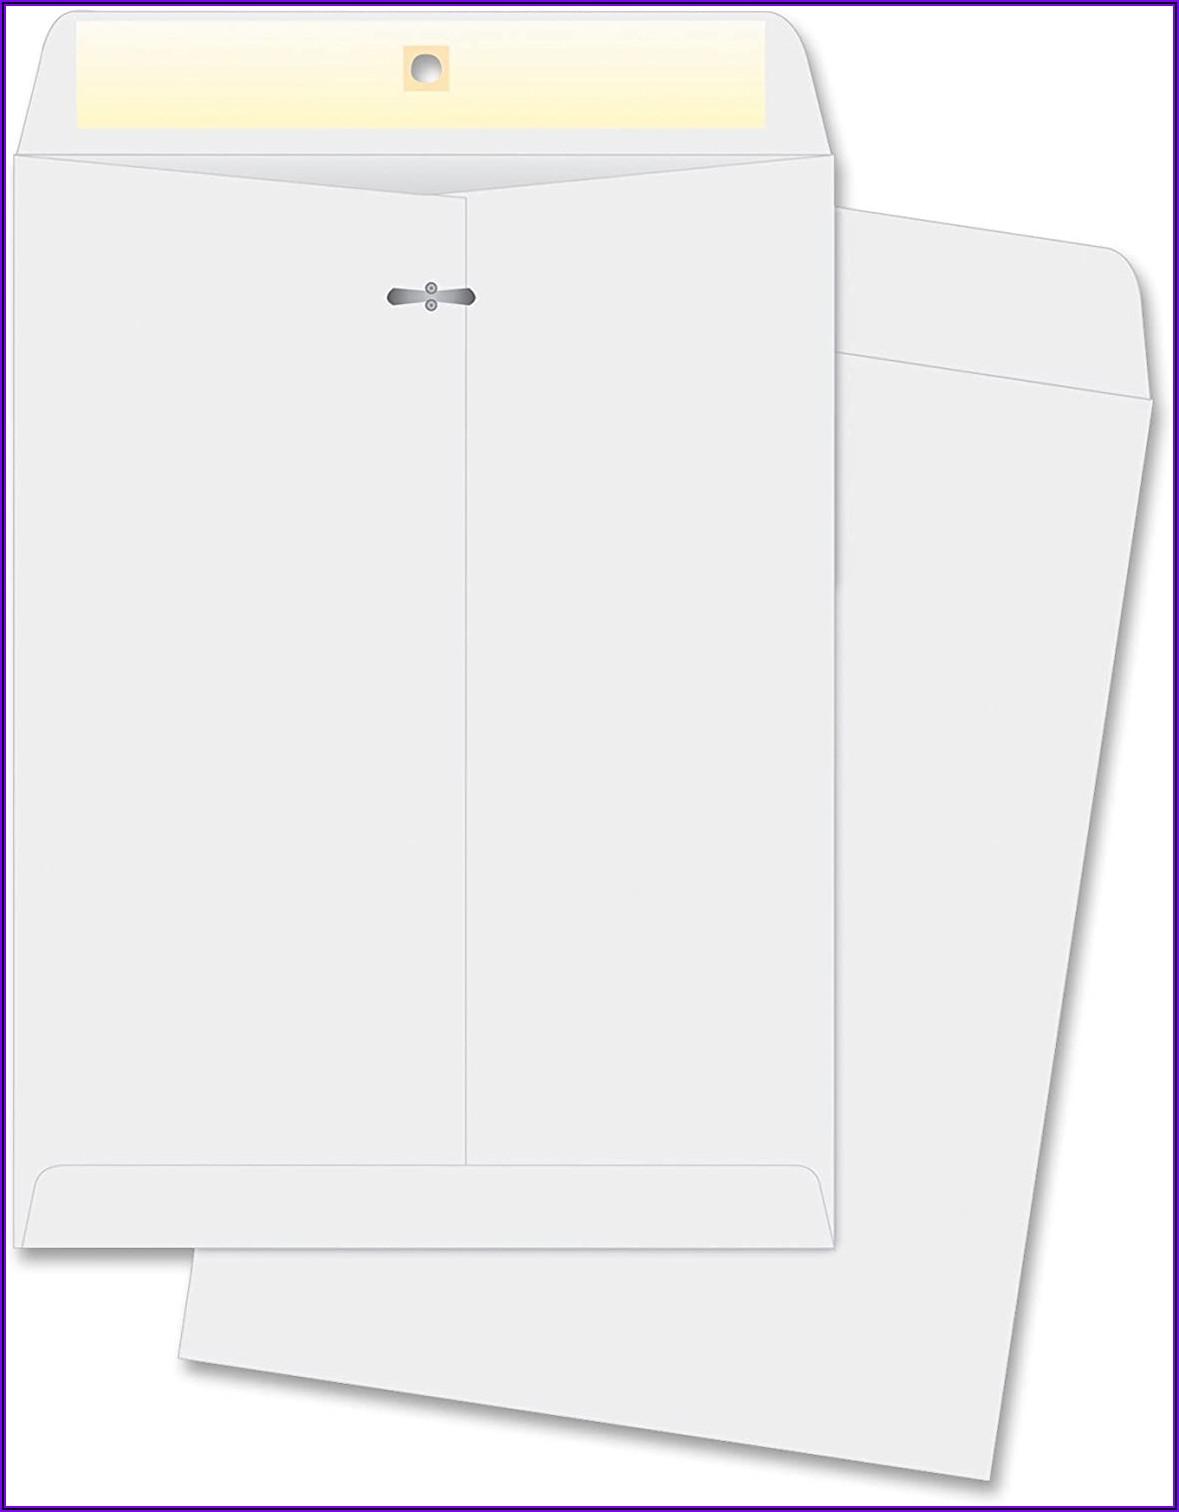 Staples 9 X 12 White Envelopes